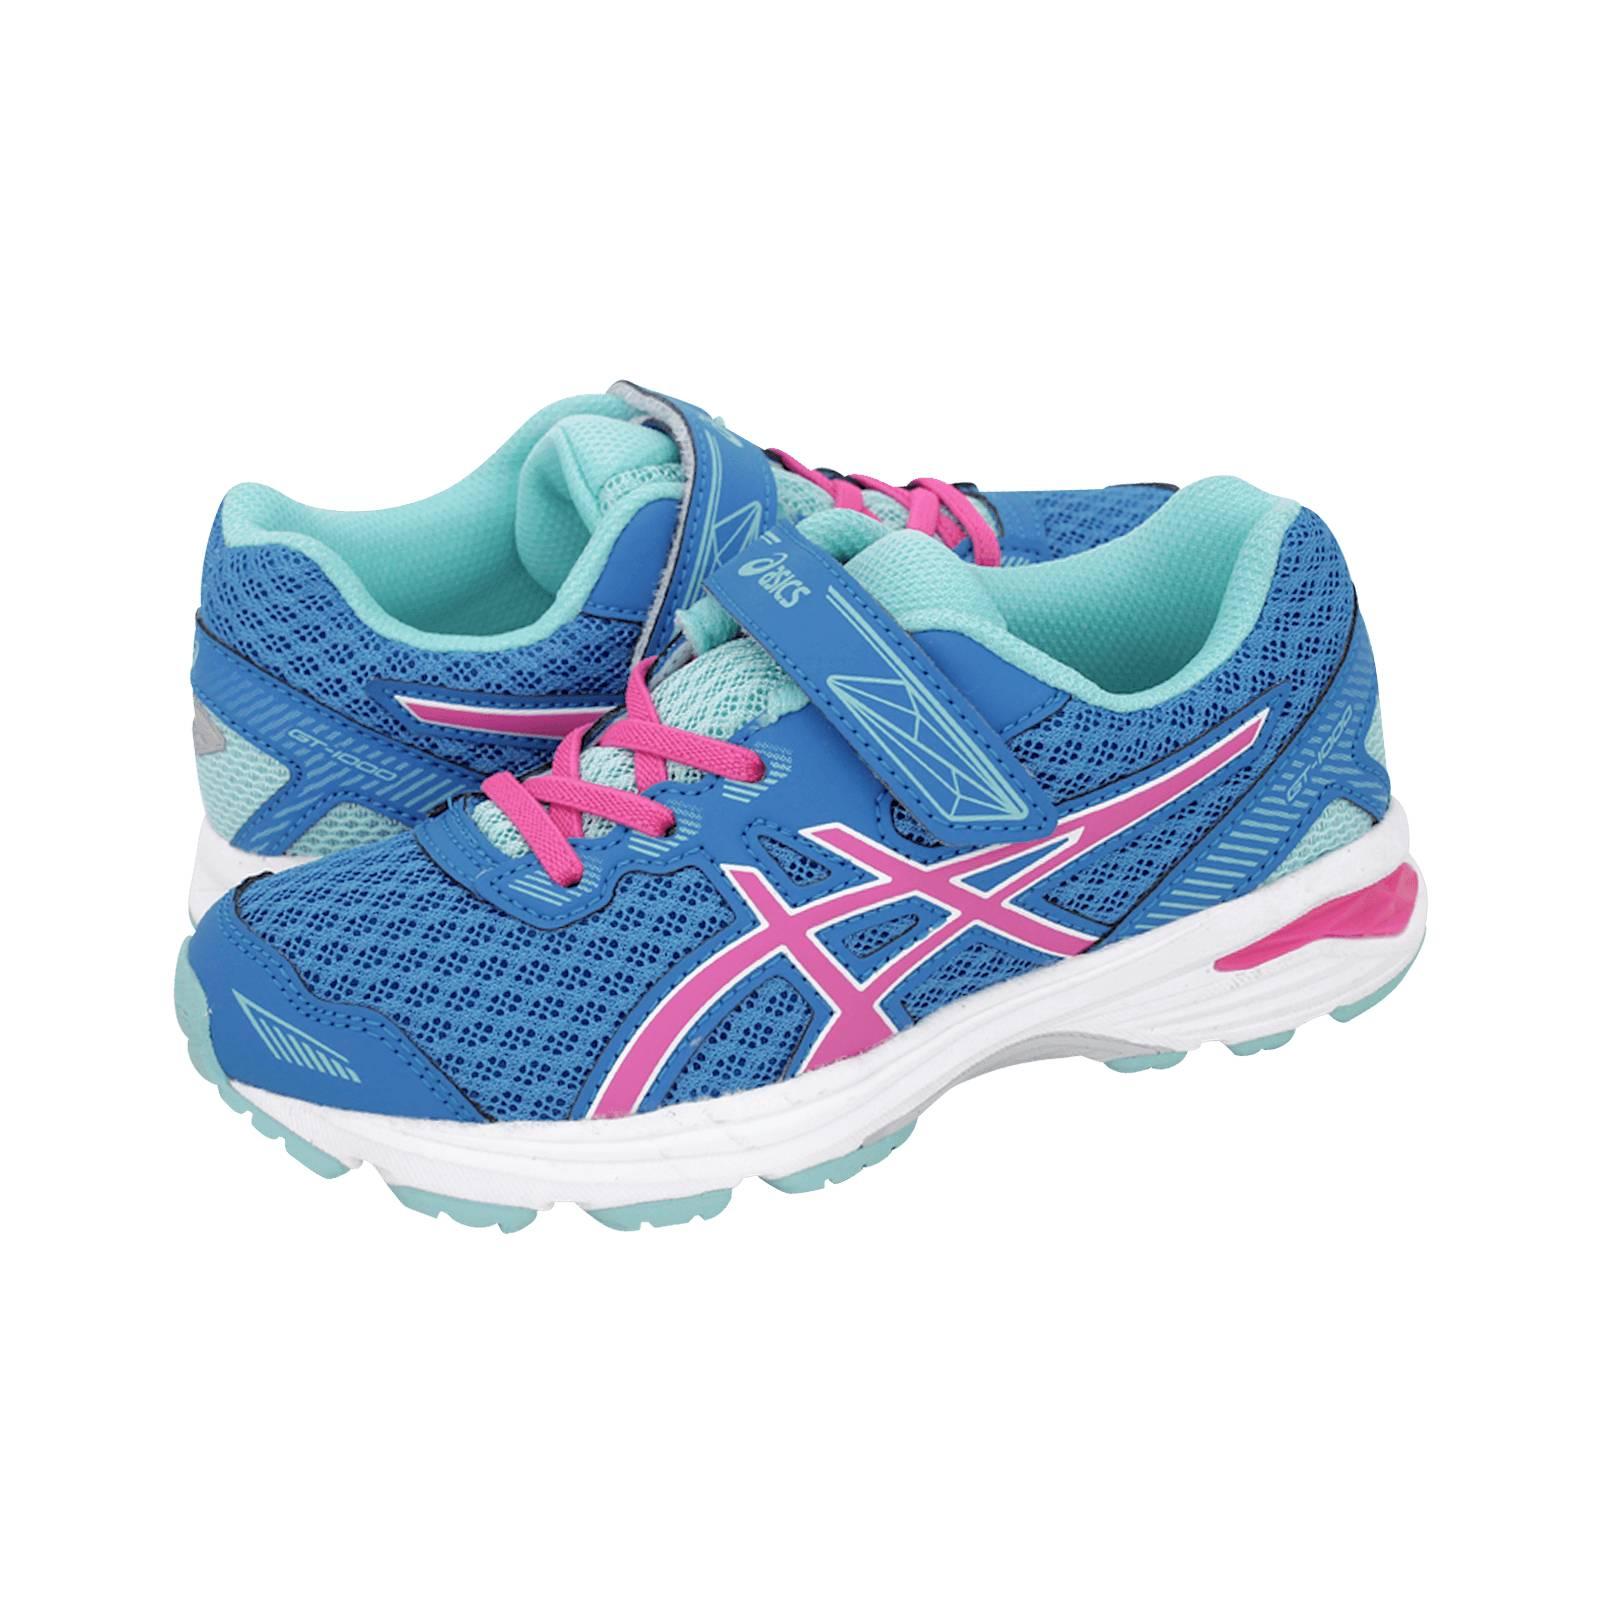 c7da9c31b450 GT-1000 5 PS - Παιδικά αθλητικά παπούτσια Asics από υφασμα και δερμα ...